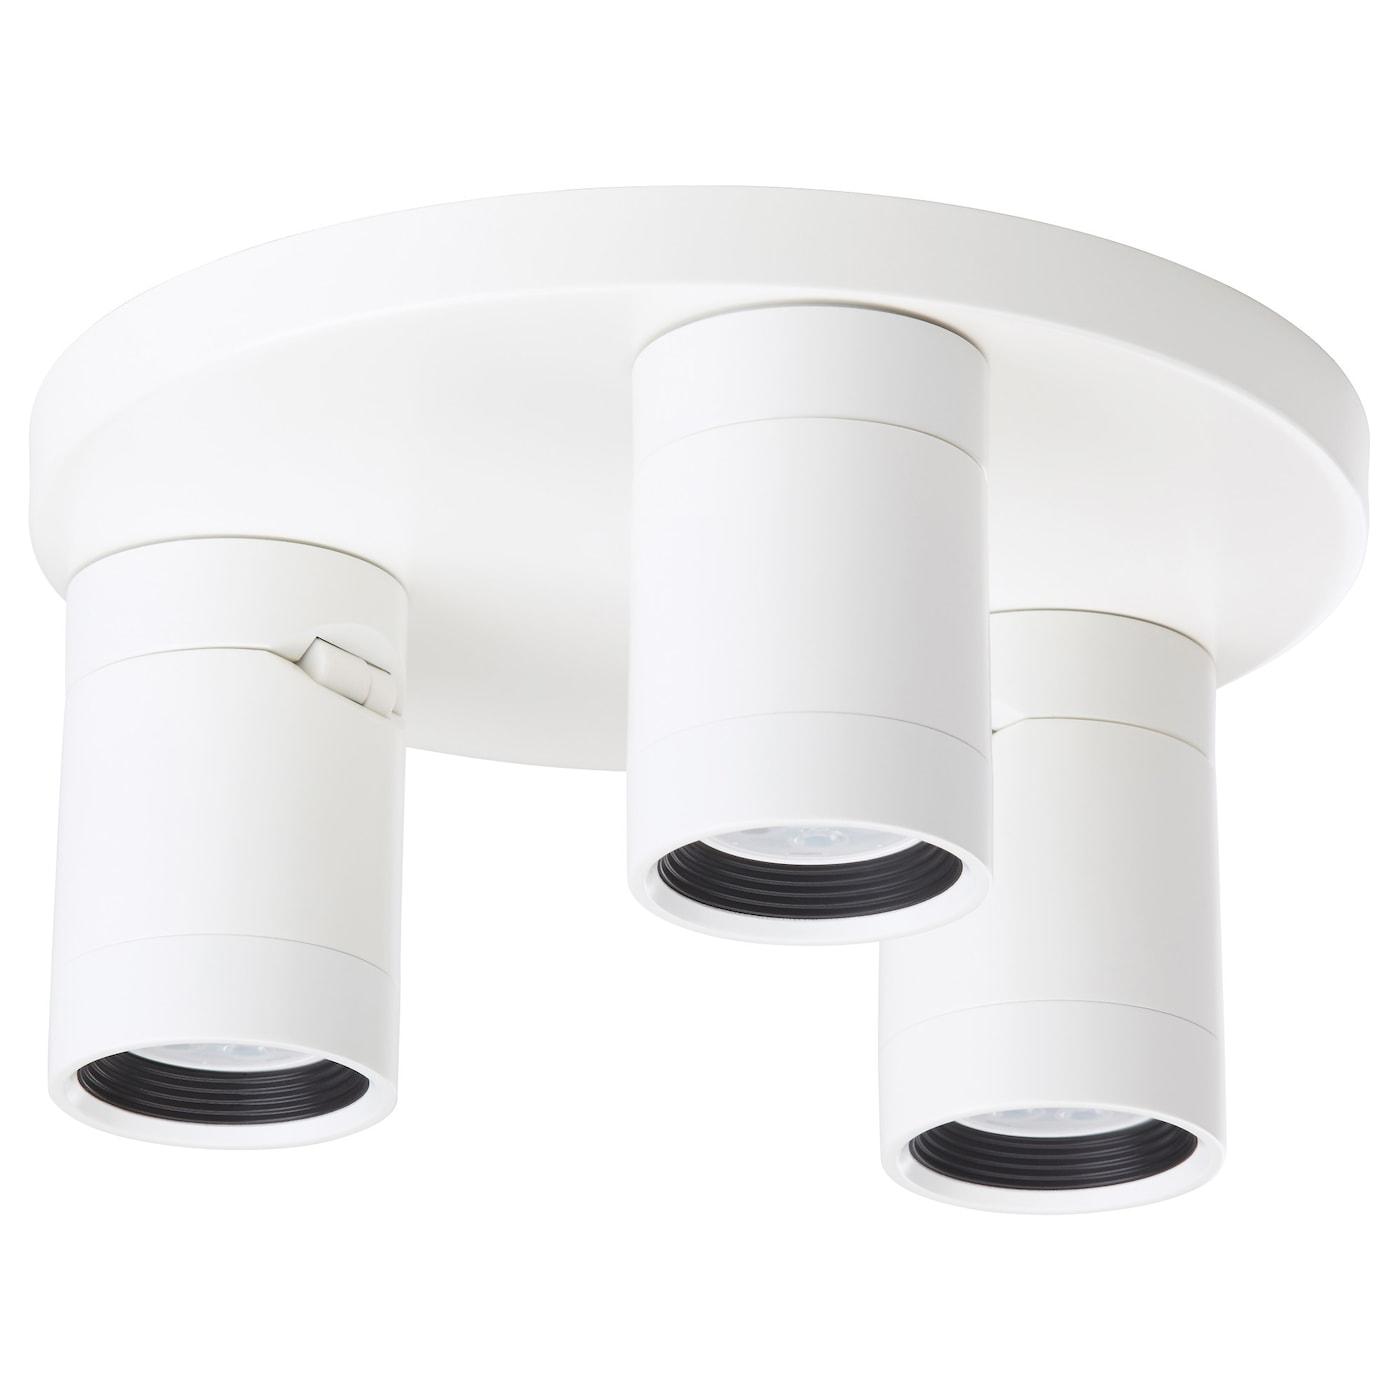 suspension plafonniers ikea. Black Bedroom Furniture Sets. Home Design Ideas